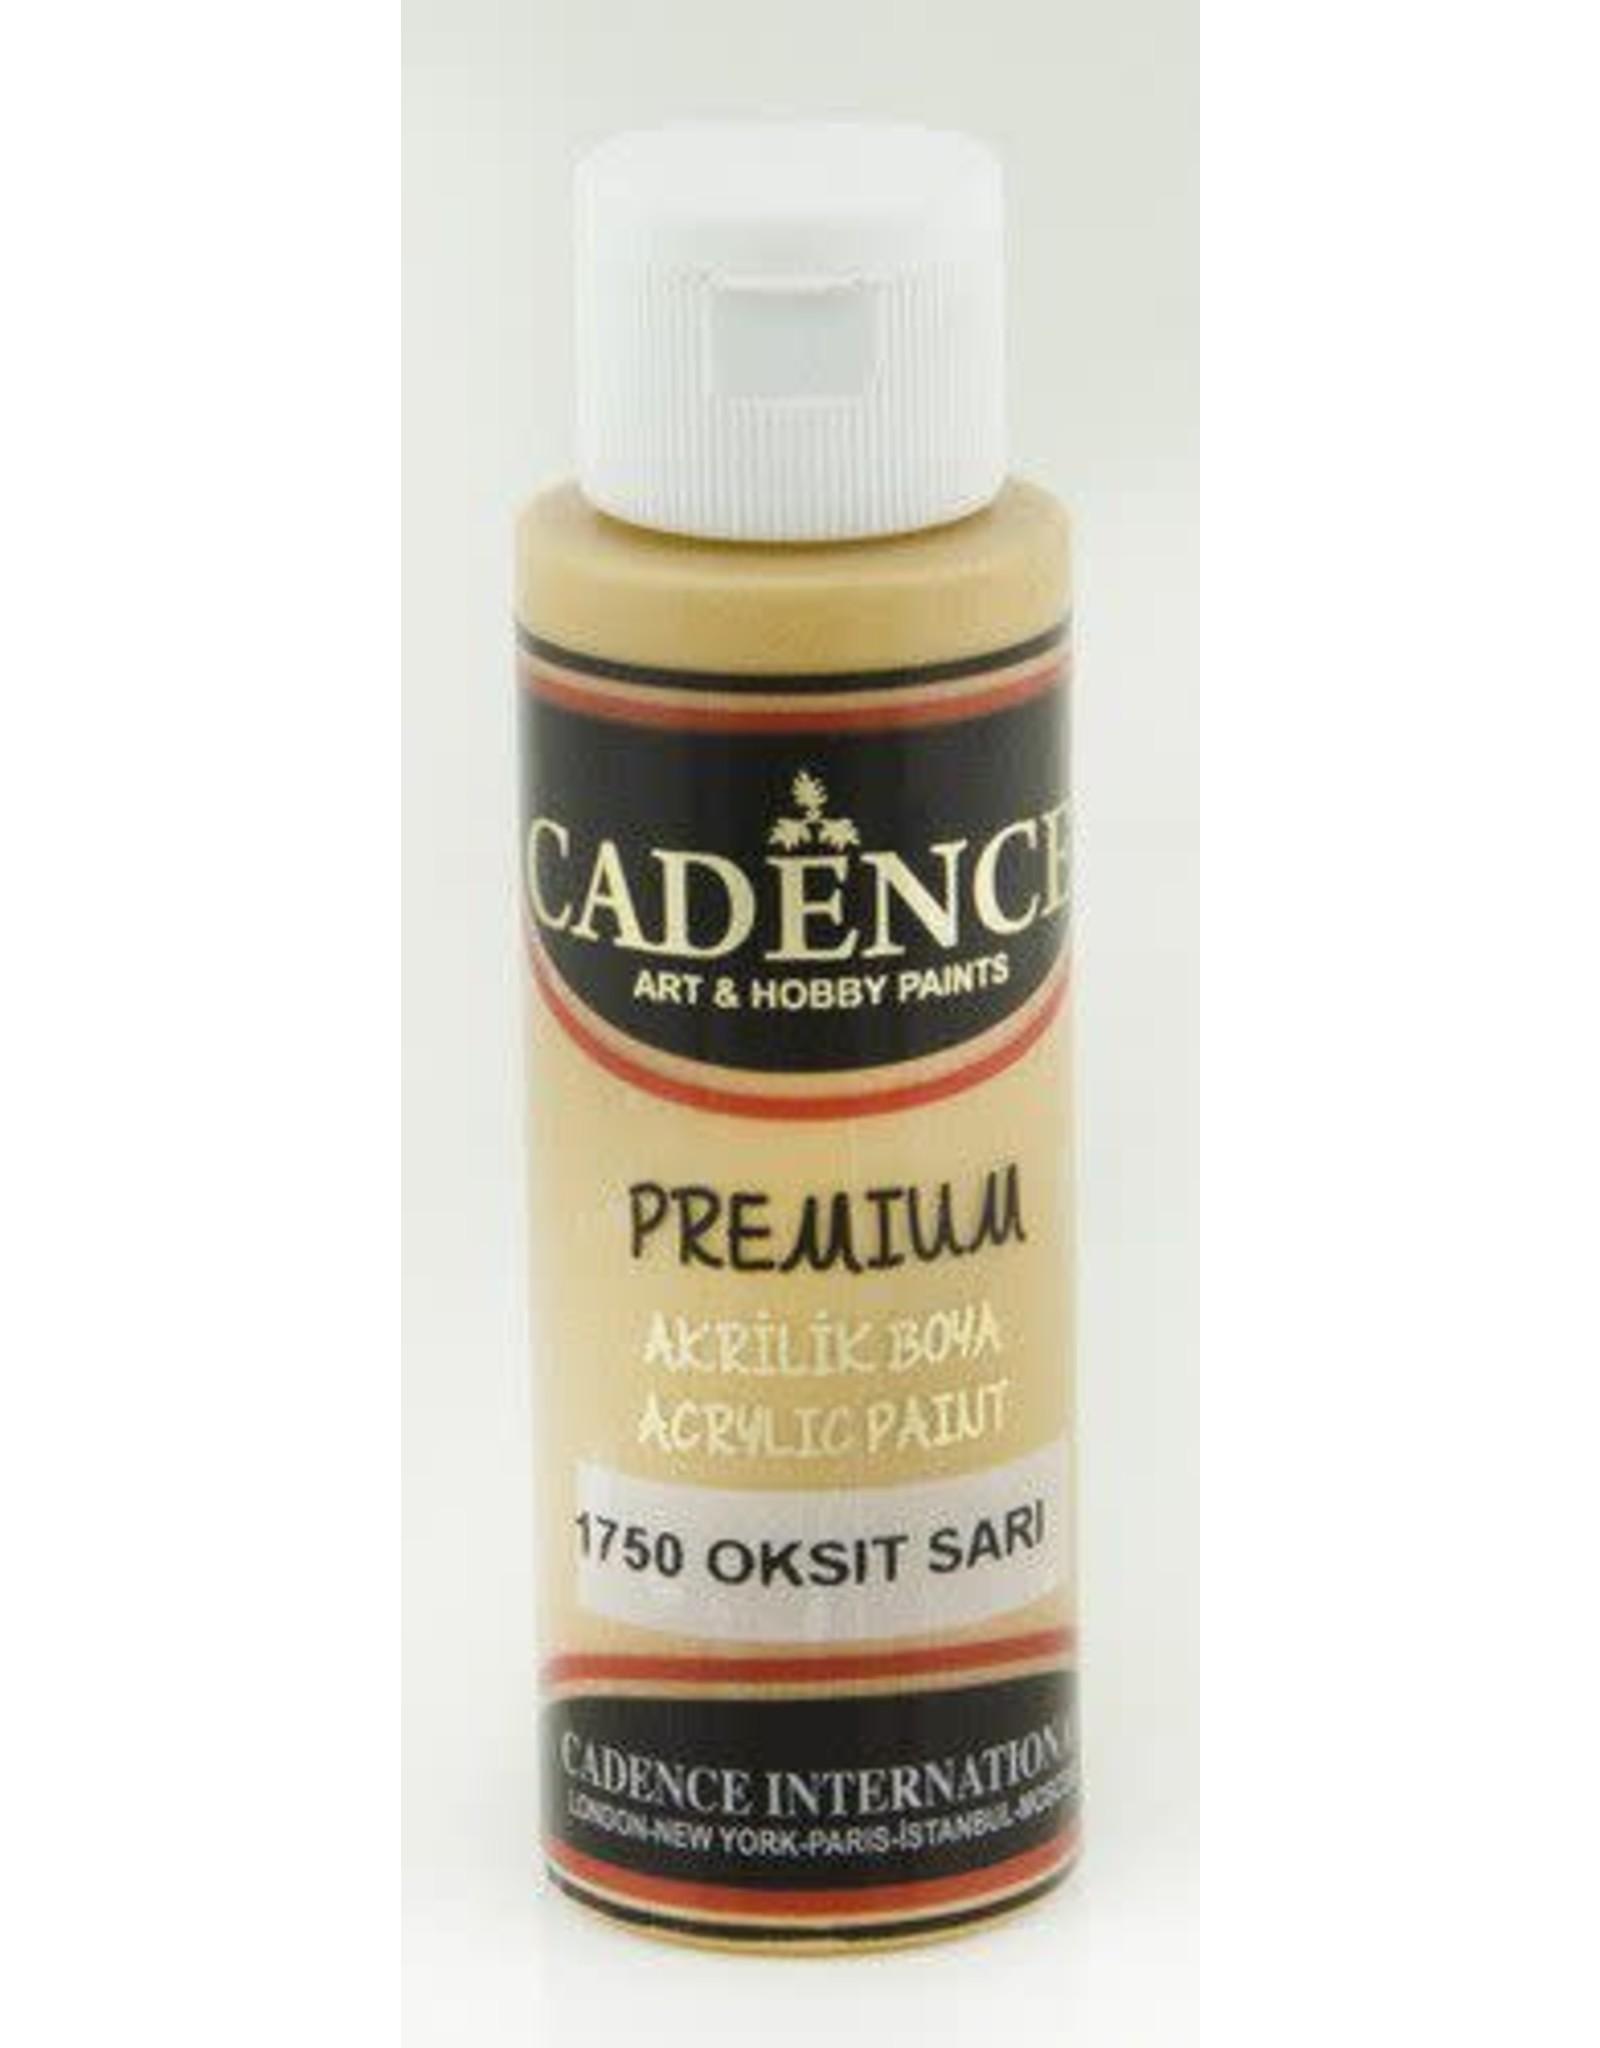 Cadence Cadence Premium acrylverf (semi mat) Oxide geel